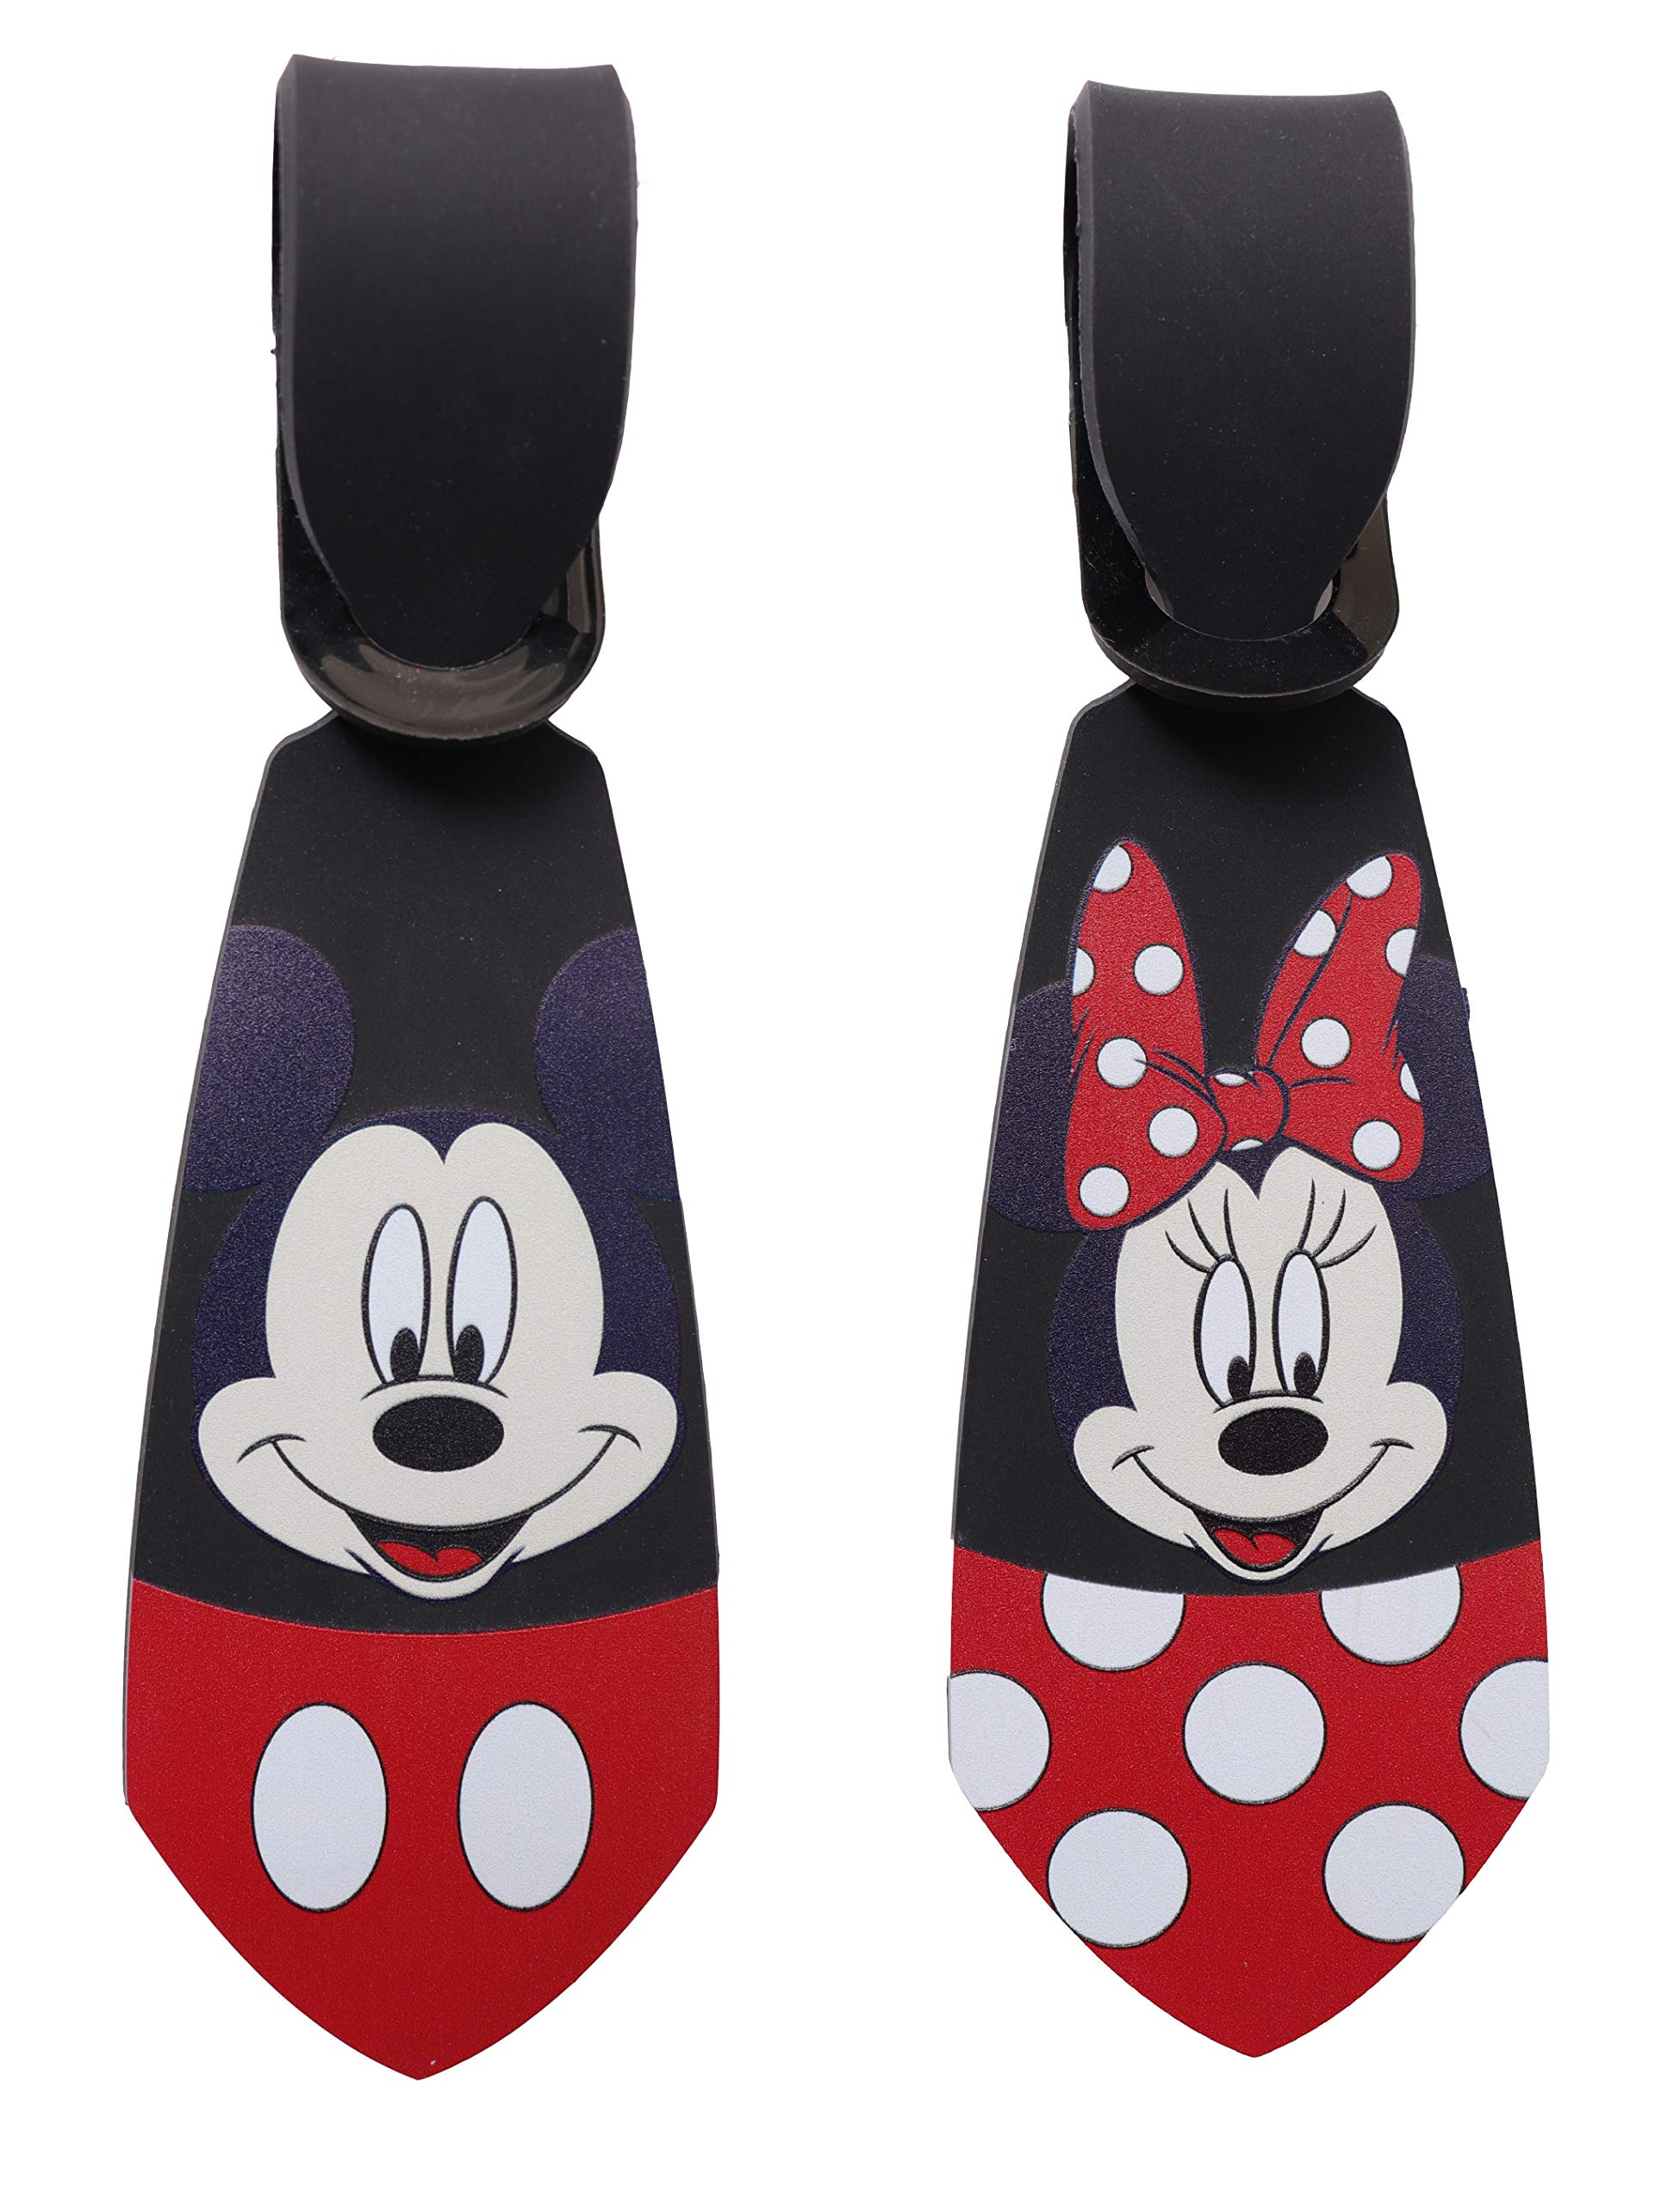 Super Cute Kawaii Cartoon Silicone Travel Luggage ID Tag Tie for Bags (Mickey&Minnie Luggage Tie)